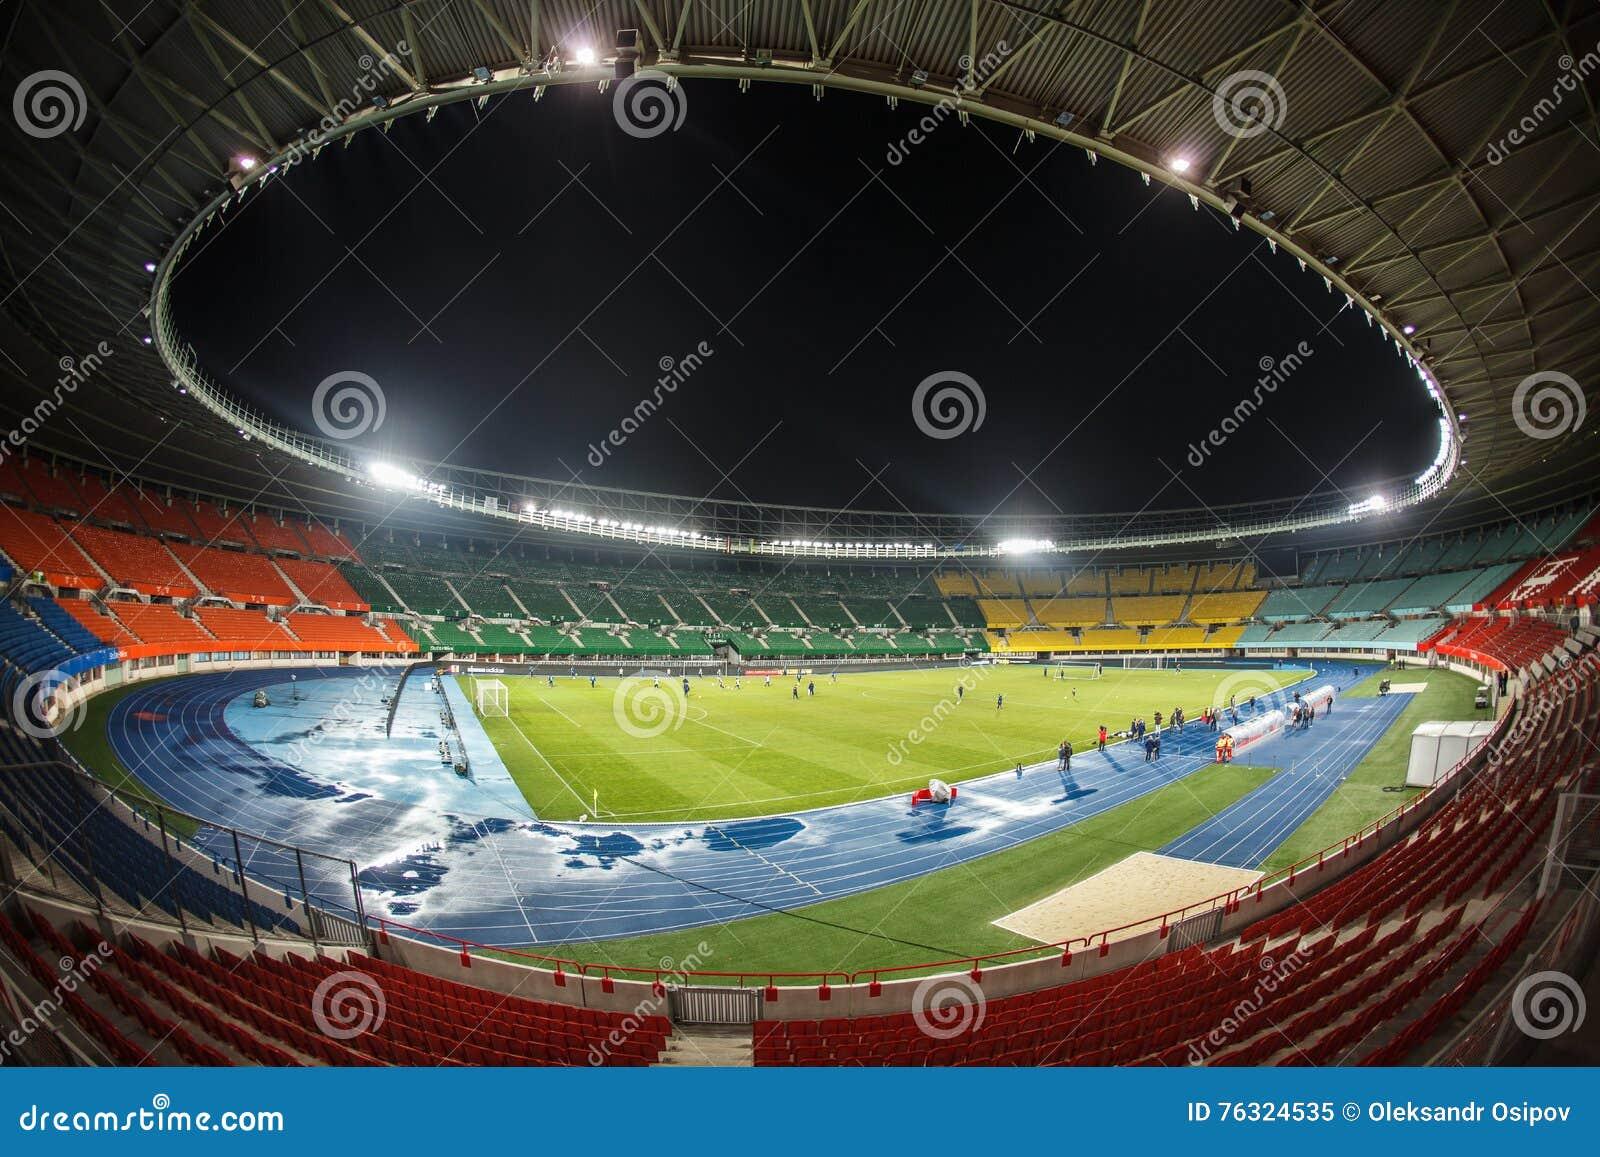 Ernst Happel Stadion Editorial Image Image Of Championship 76324535